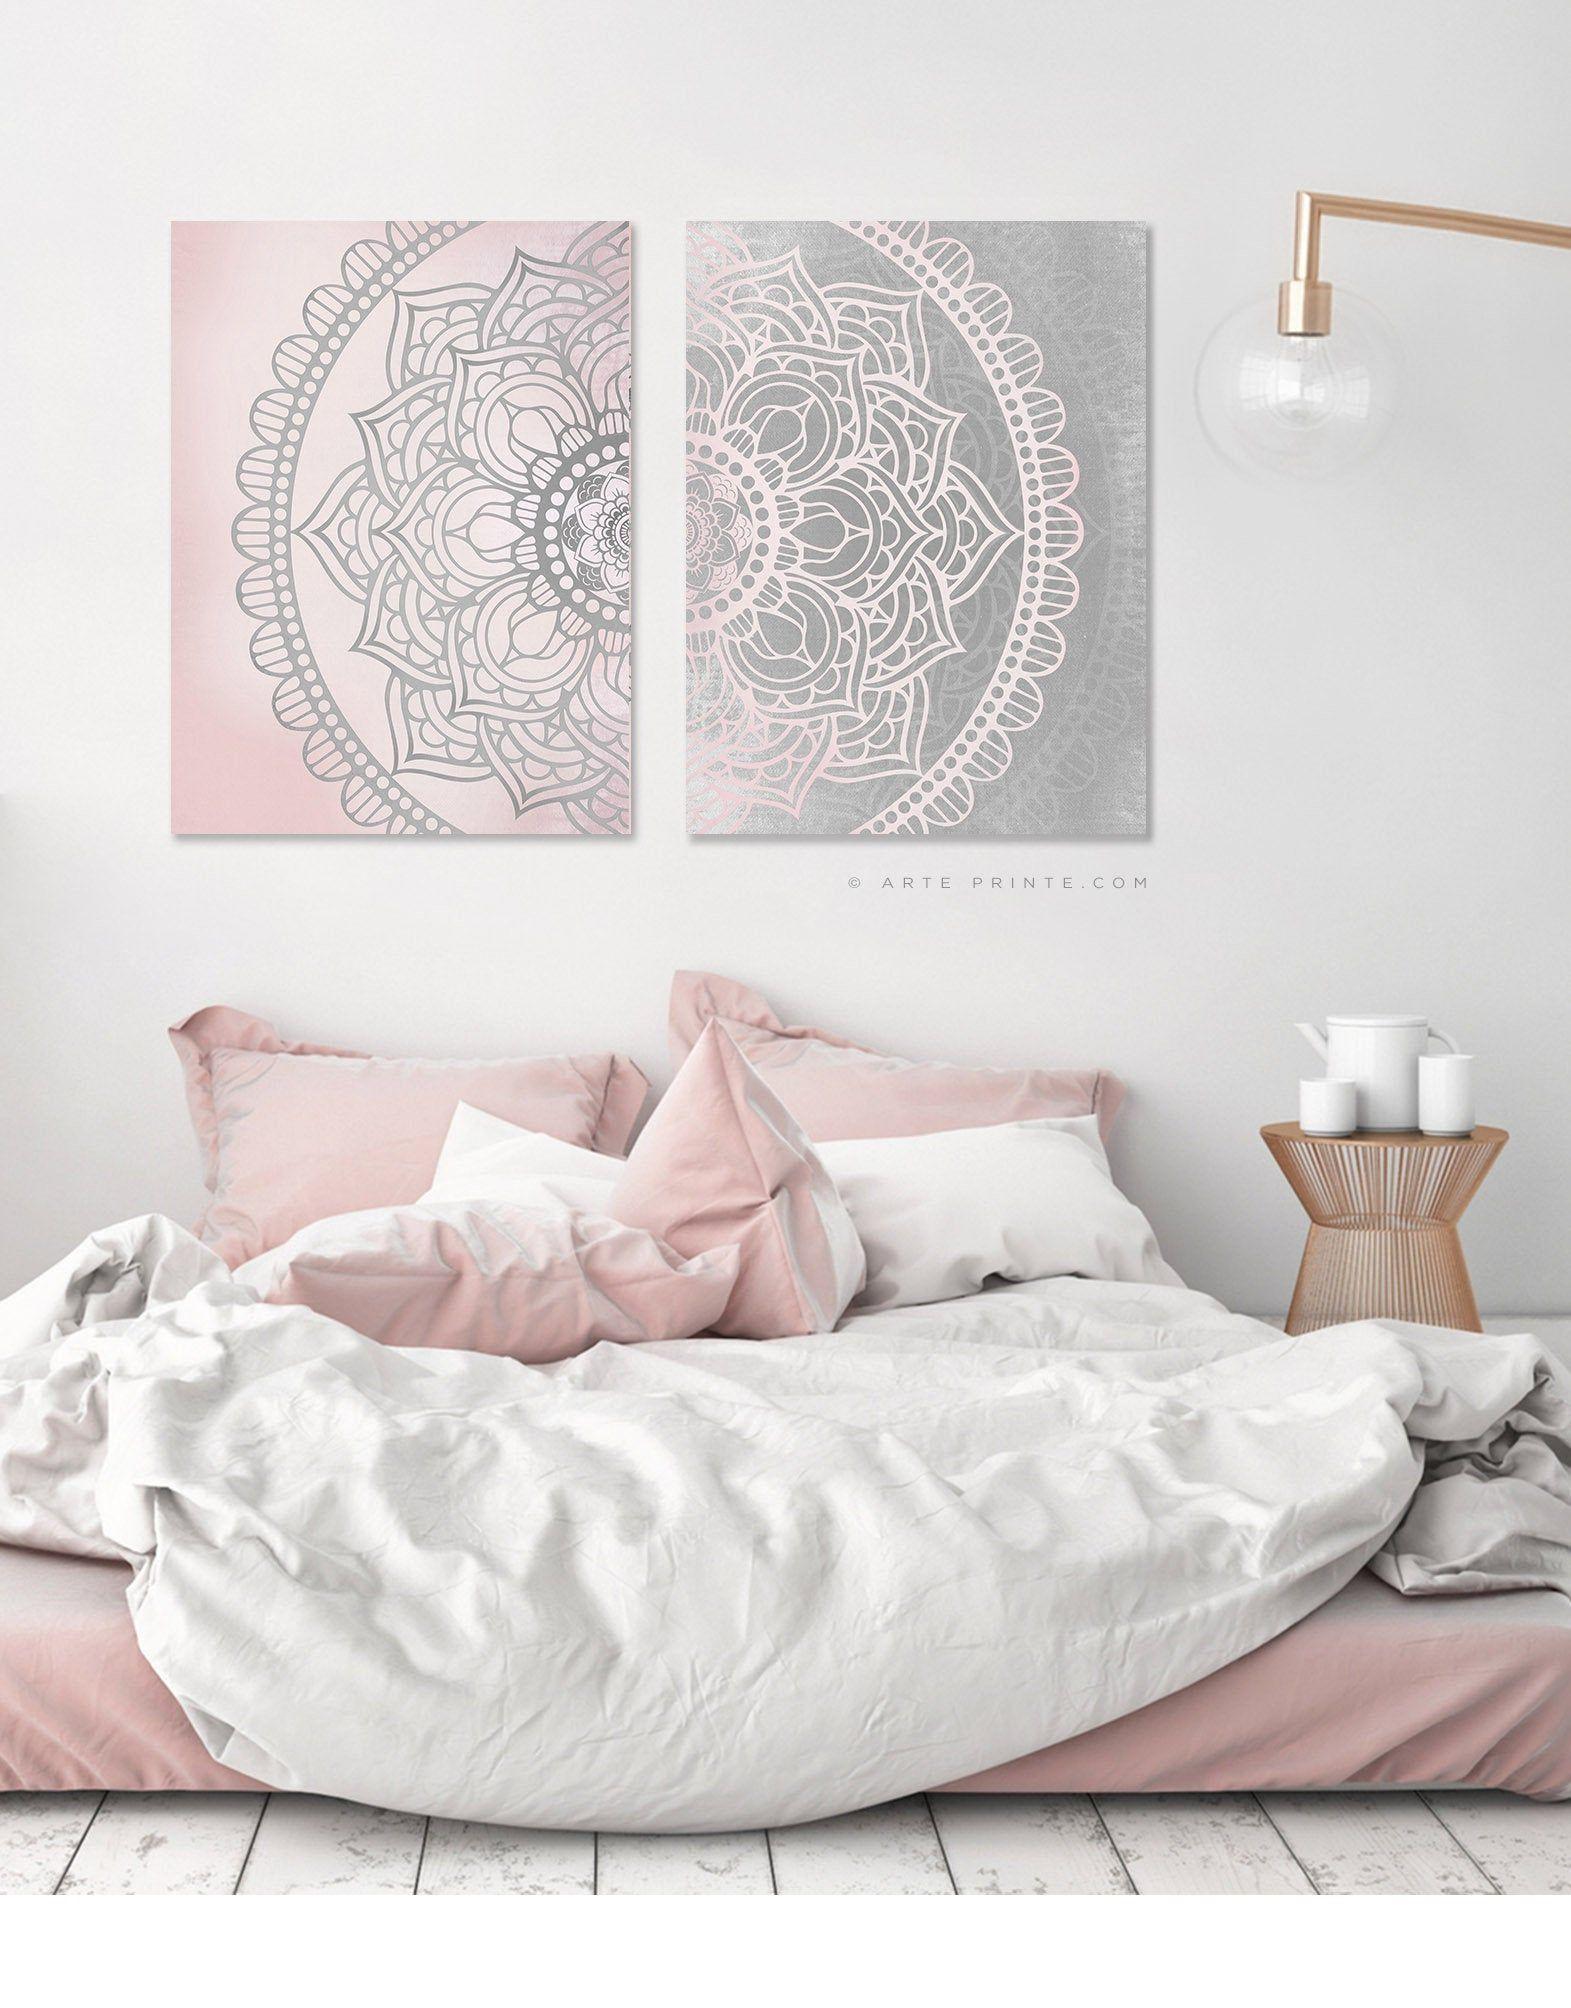 Pink Gray Mandala Wall Art Set Of 2 Prints Boho Living Room Etsy Blush Pink And Grey Bedroom Bedroom Wall Wall Decor Bedroom